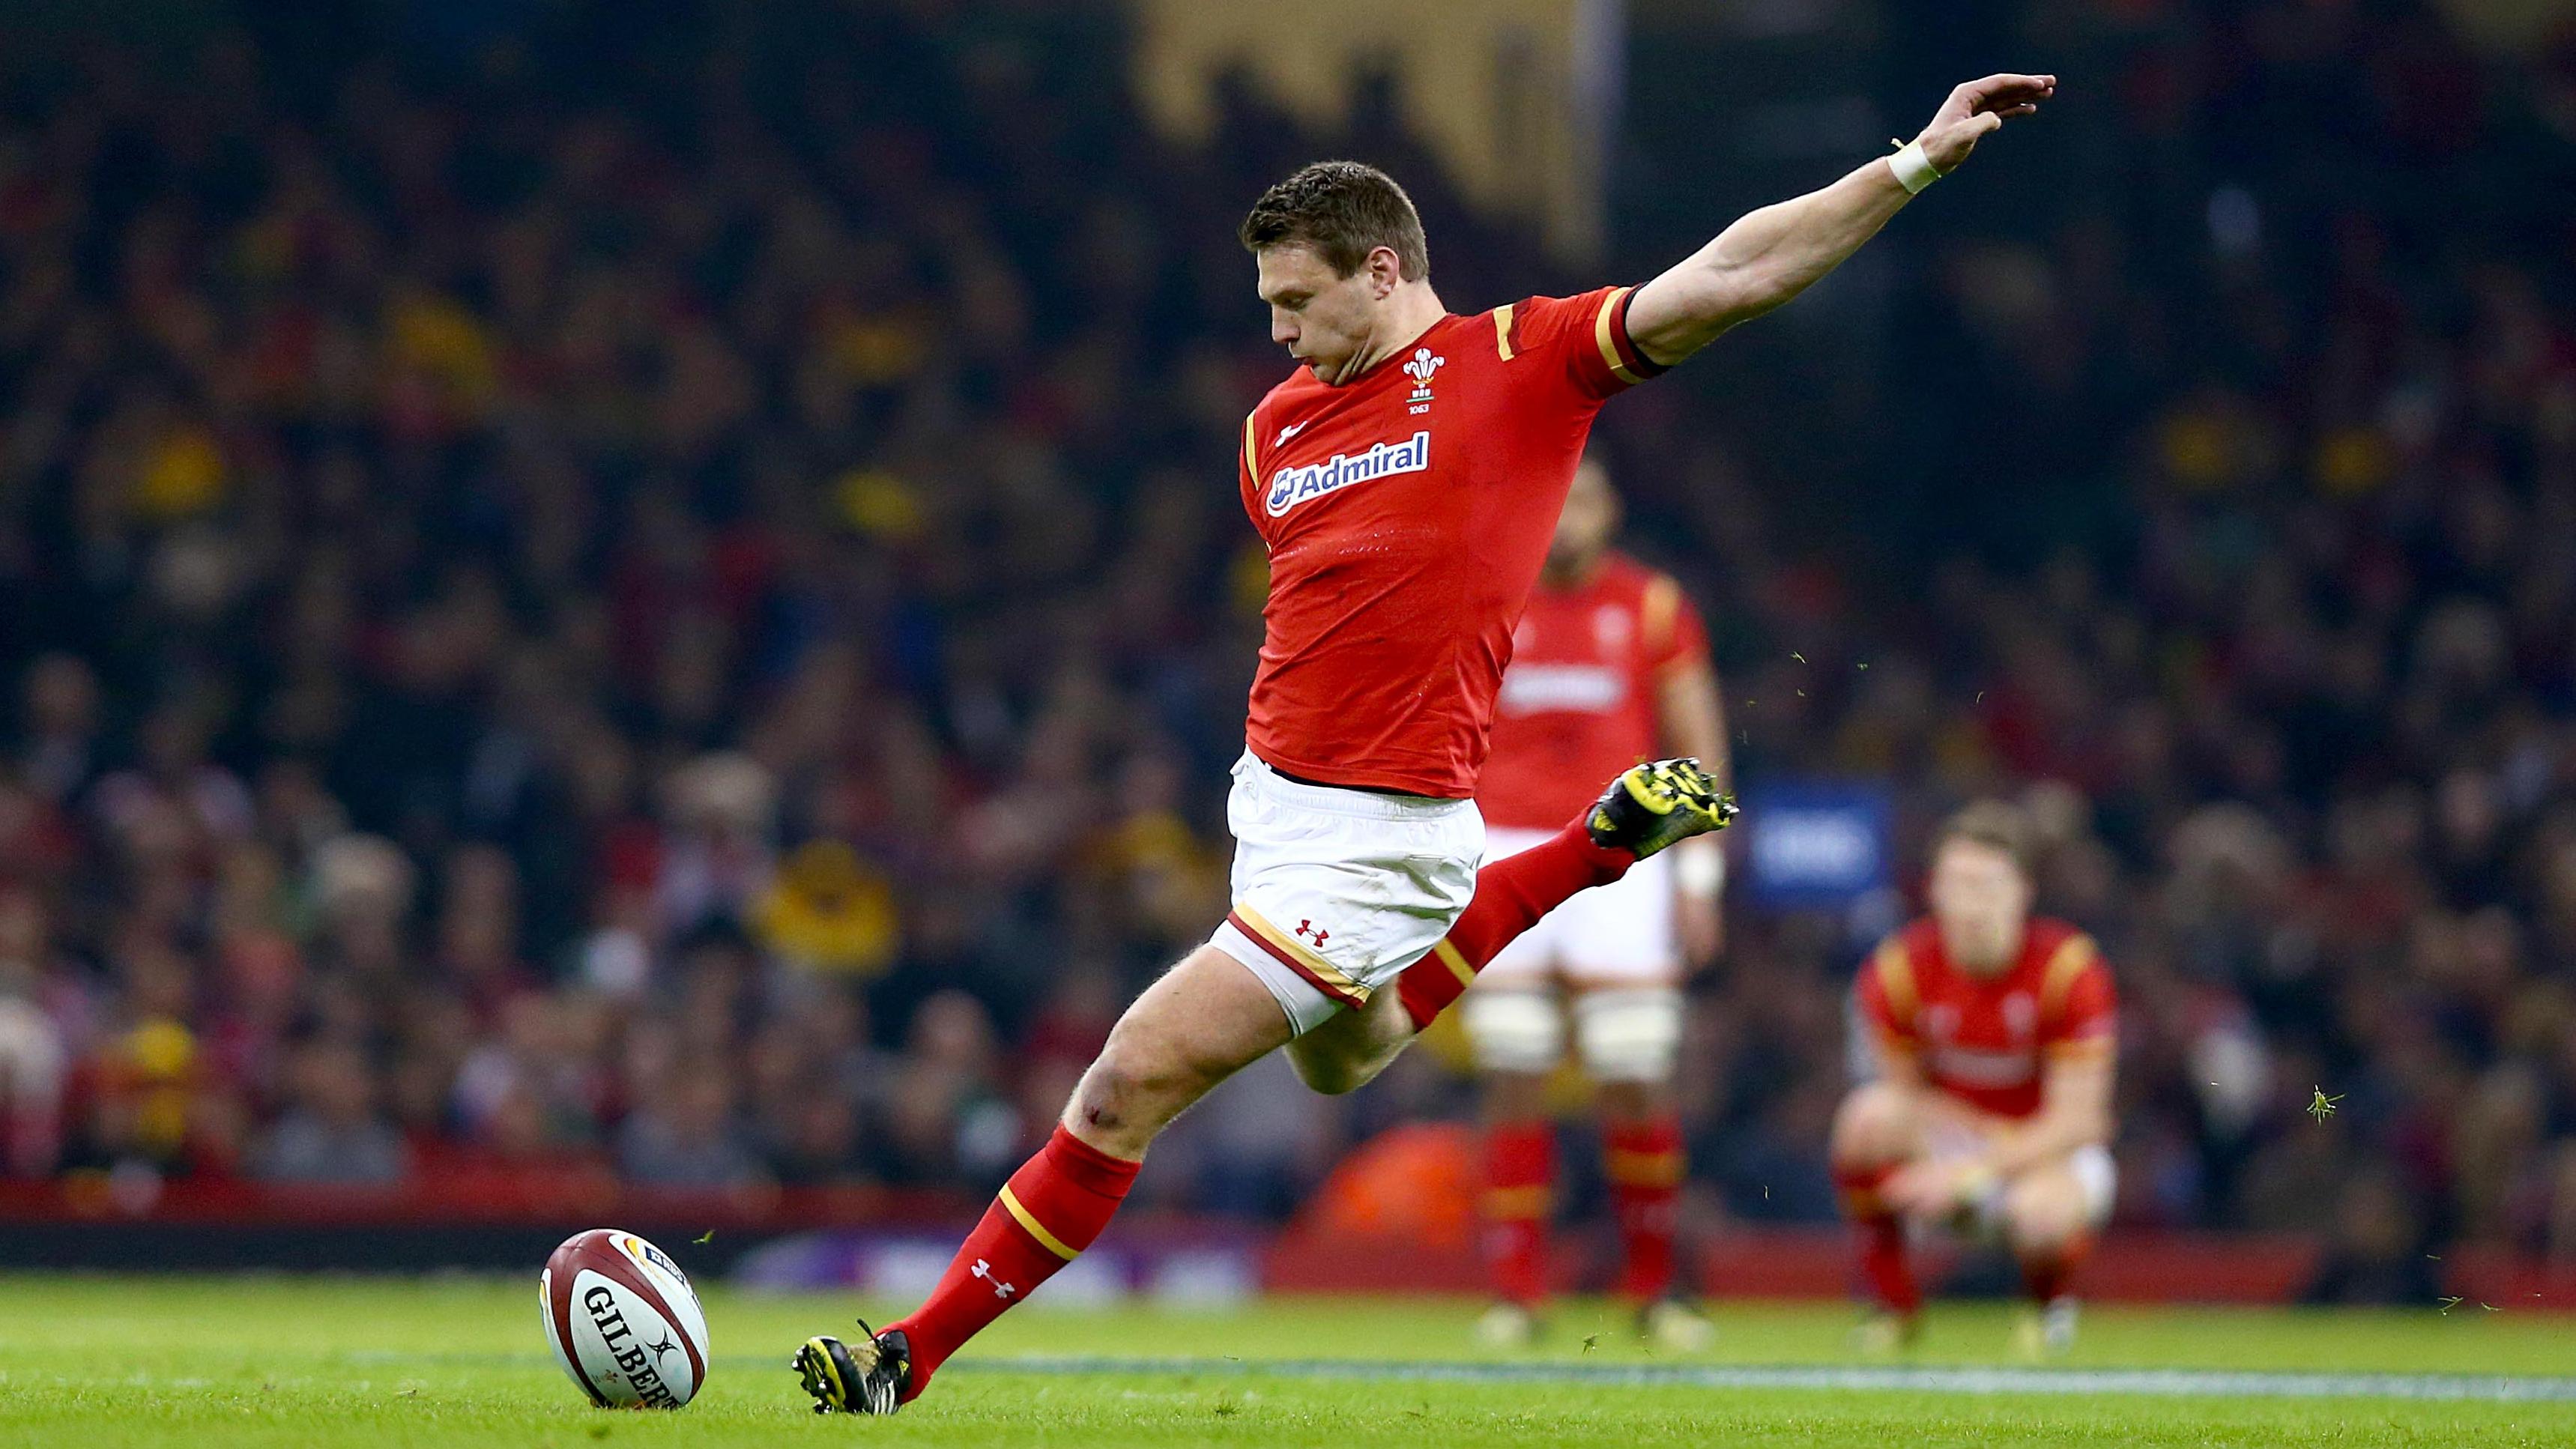 Wales' Biggar hailed after landmark points record